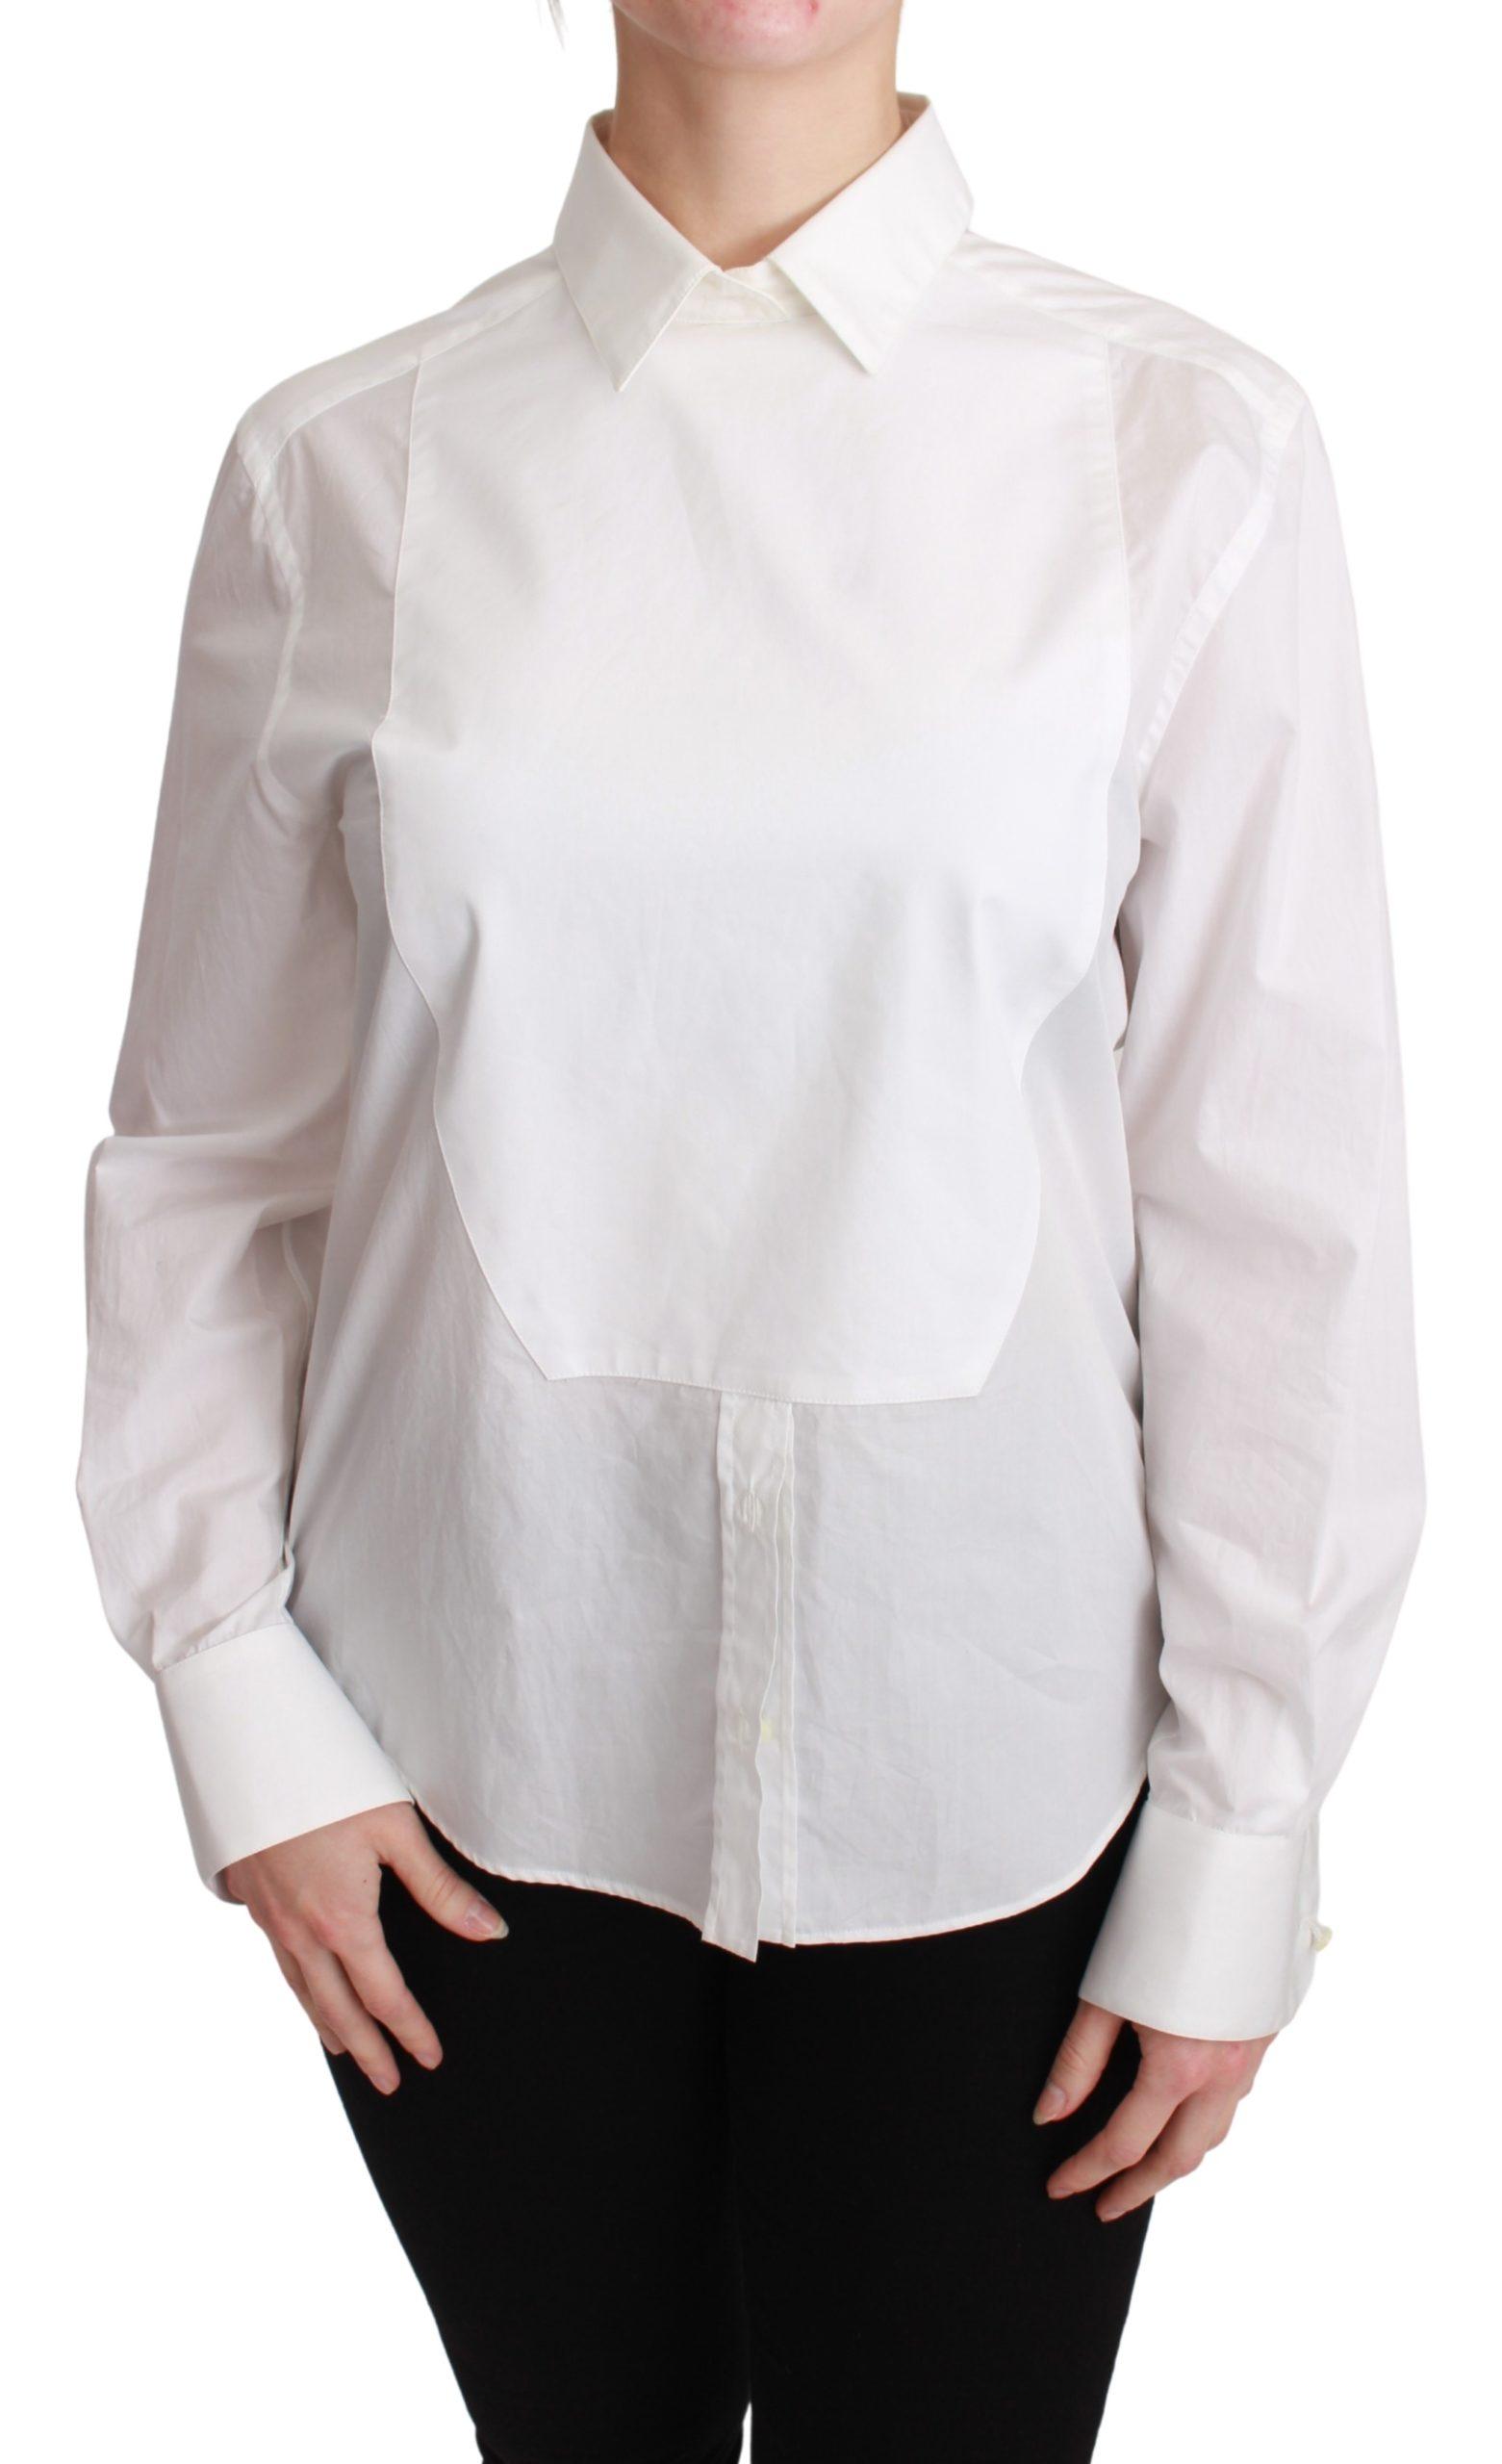 Dolce & Gabbana Women's Collared Cotton Shirt White TSH2685 - IT40|S